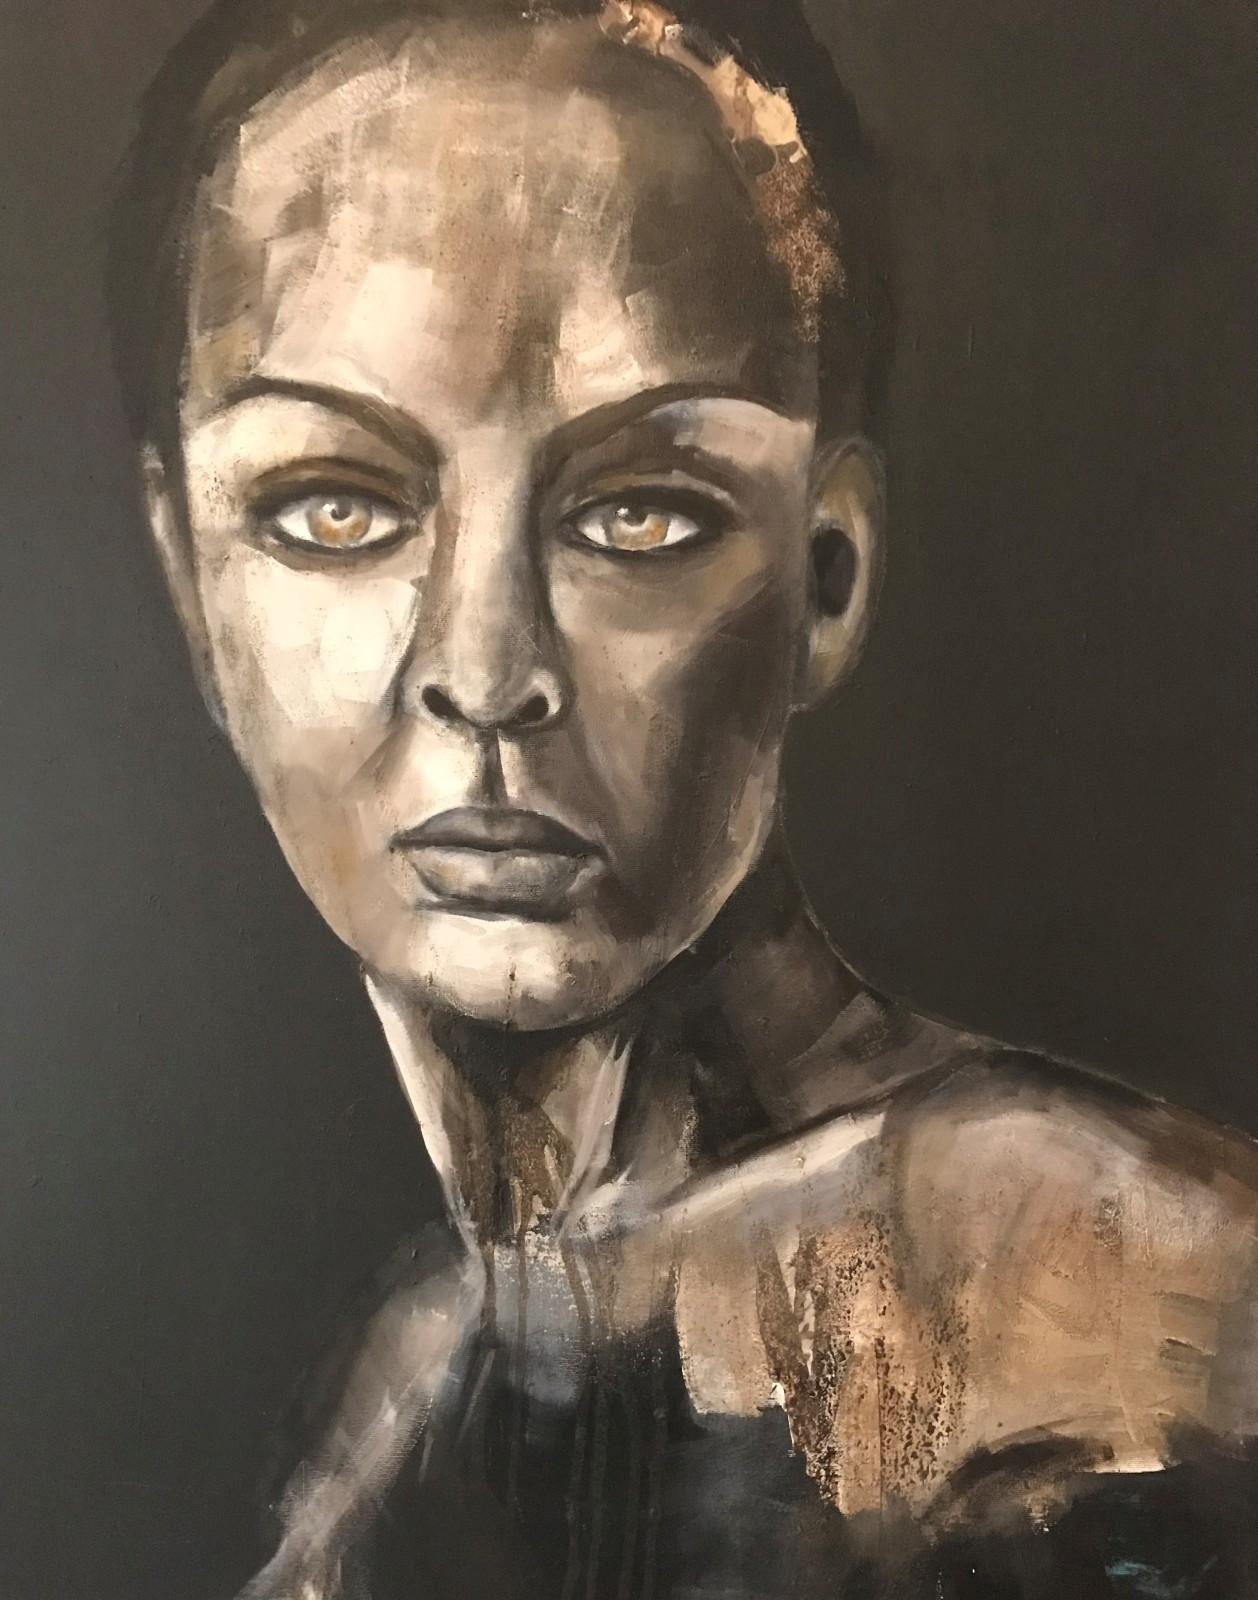 Porträt, 'Aino', Öl-Mischtechnik auf Leinwand, 100 cm h x 80 cm b x 3 cm t